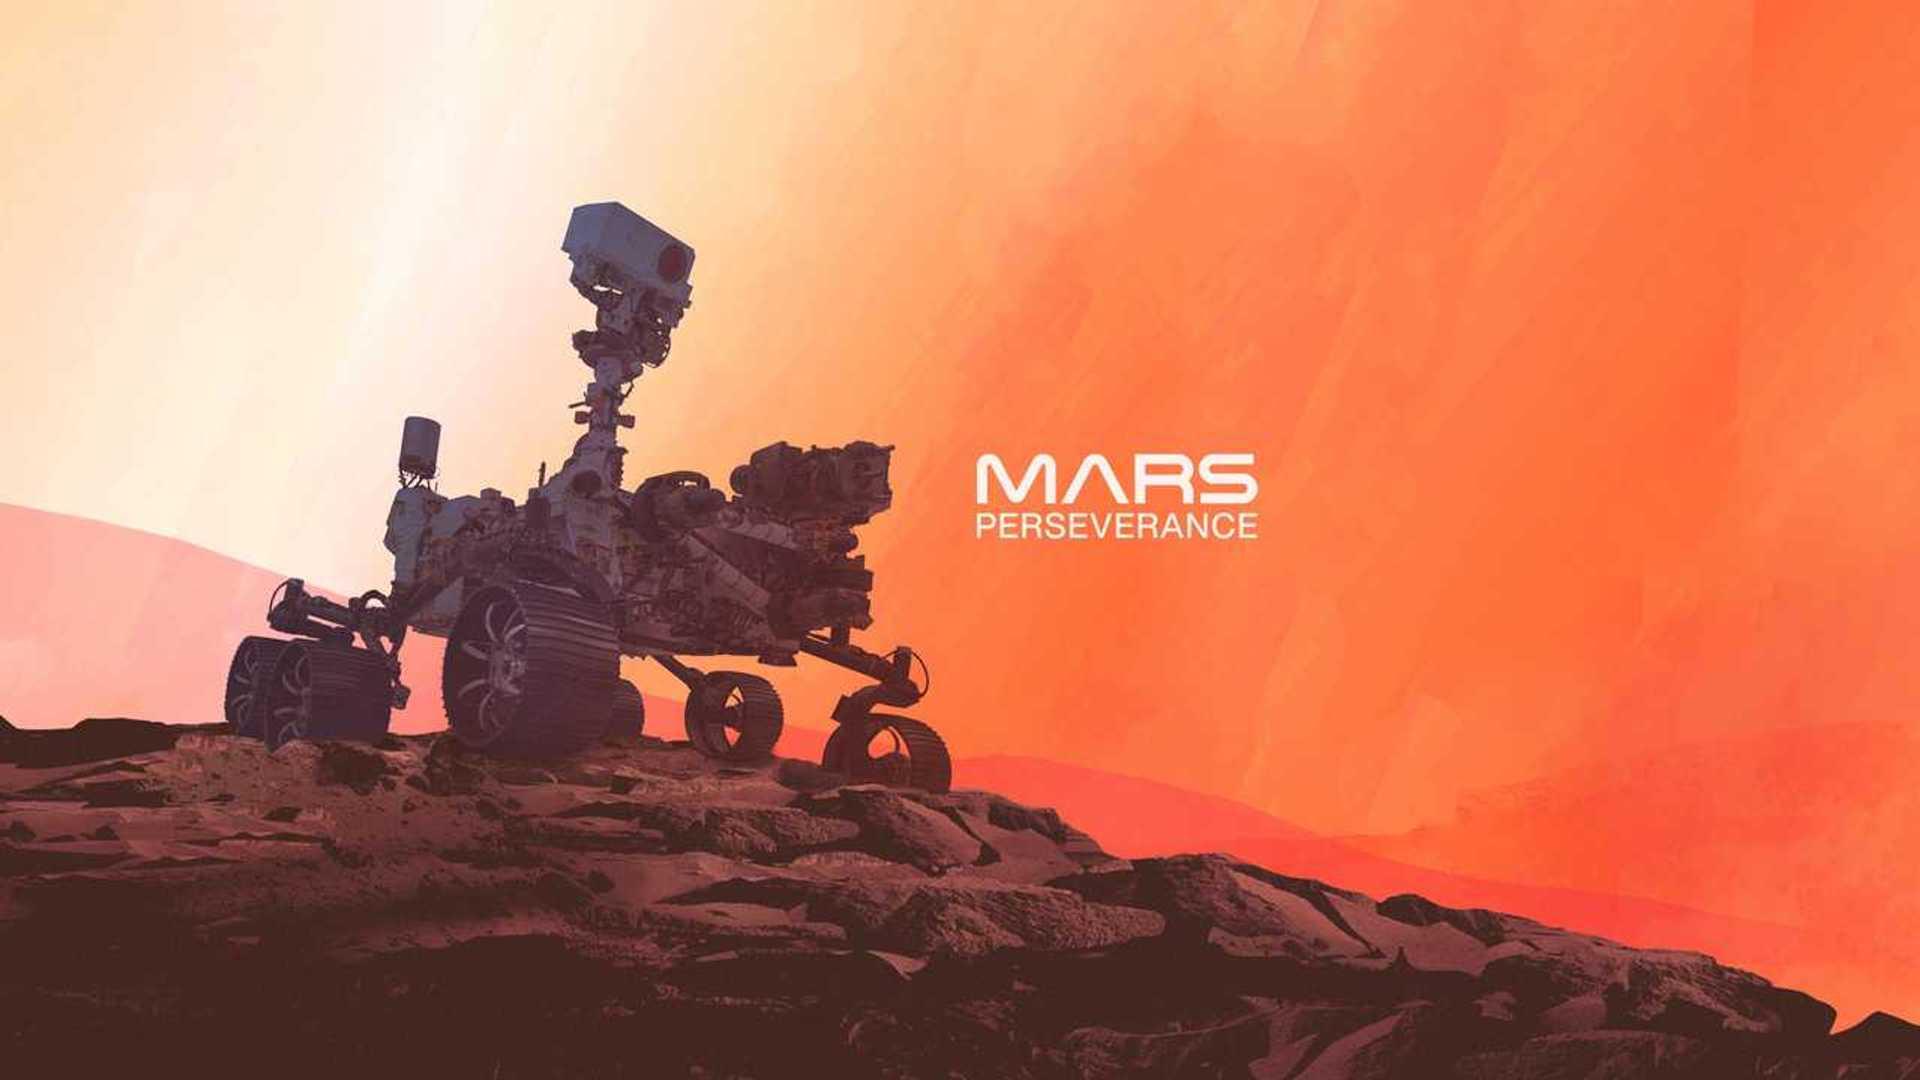 Посадка марсохода NASA Perseverance Rover на Марс: смотрите прямую трансляцию